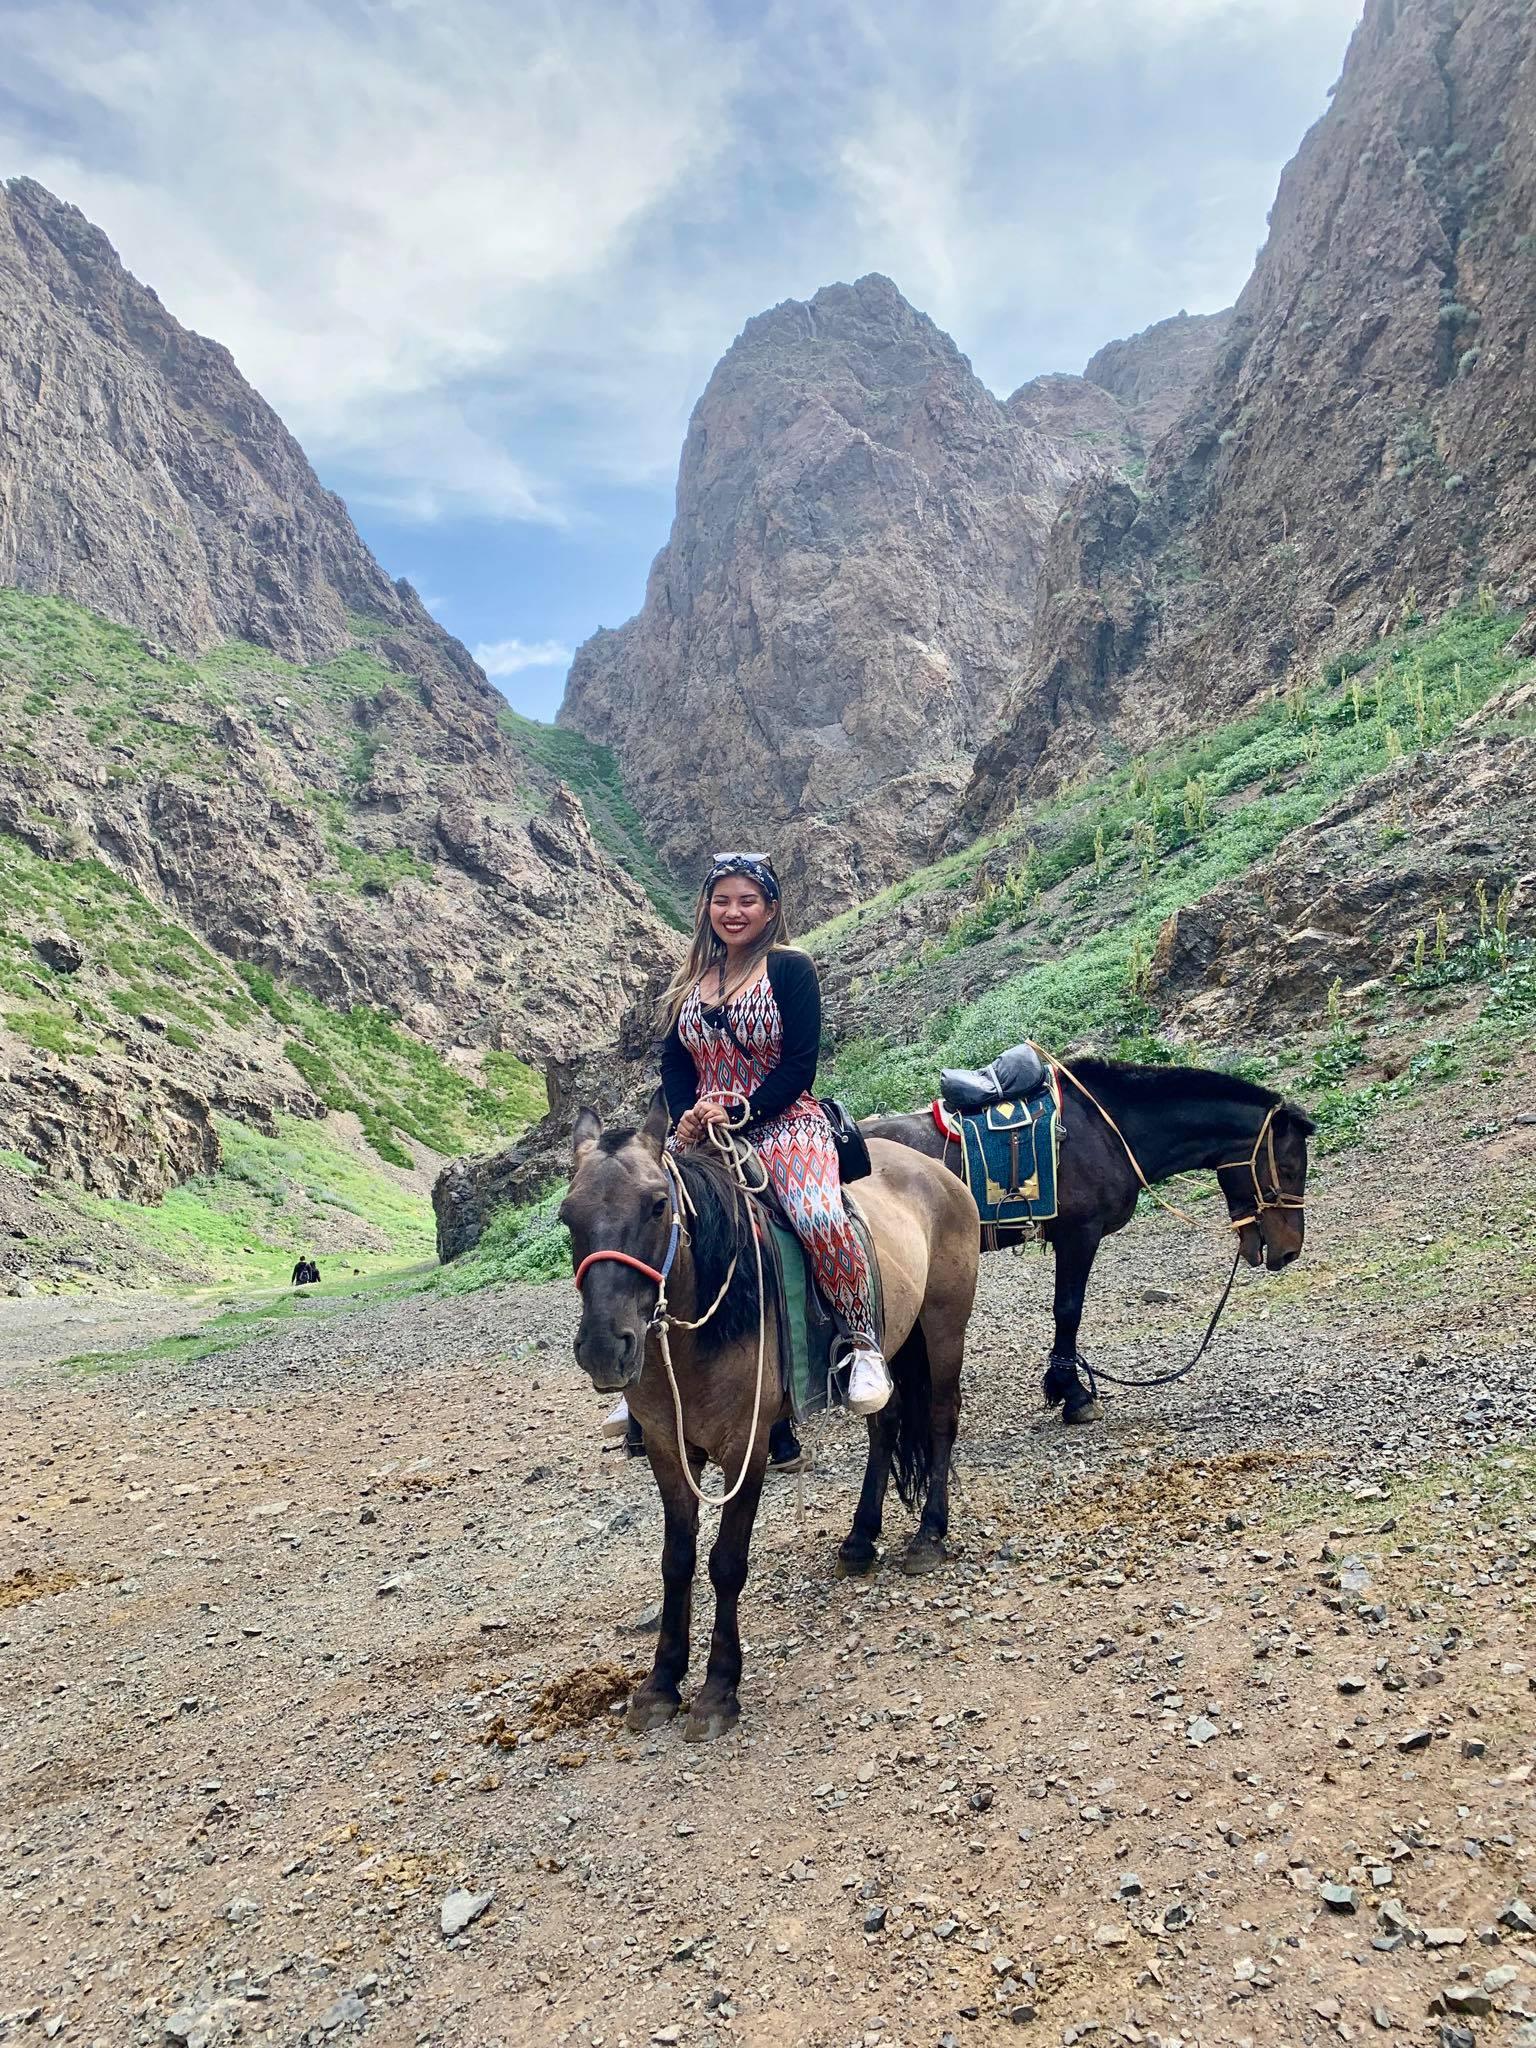 Kach Solo Travels in 2019 Horseback riding trip to the Gobi Gurvan Saikhan National Park13.jpg